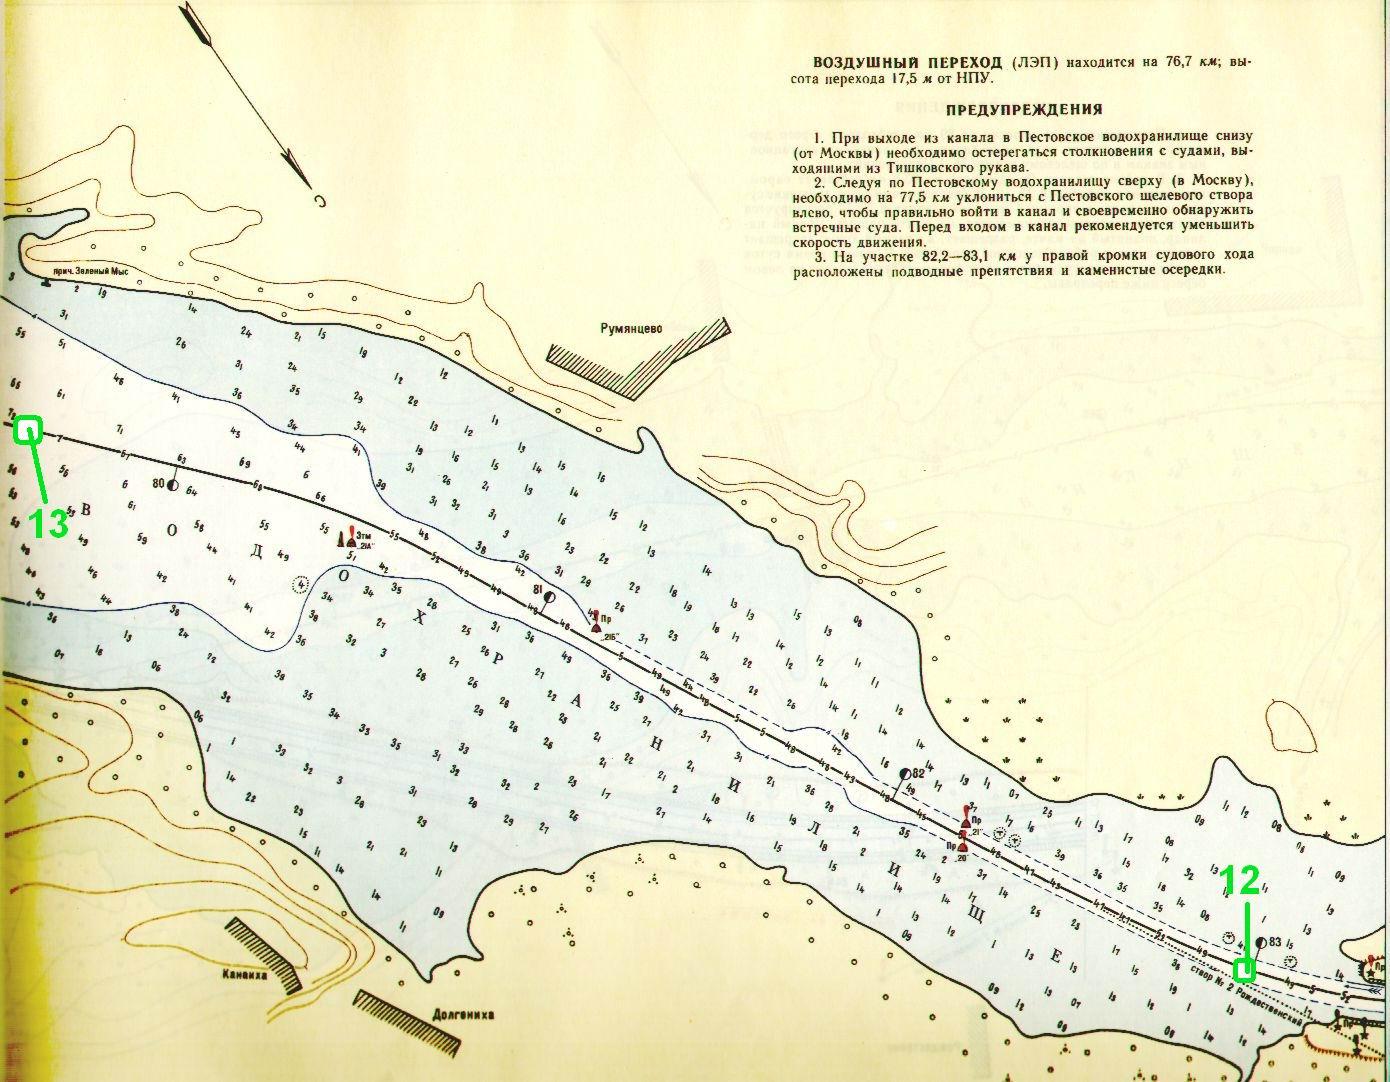 рыболовные места на канале им москвы